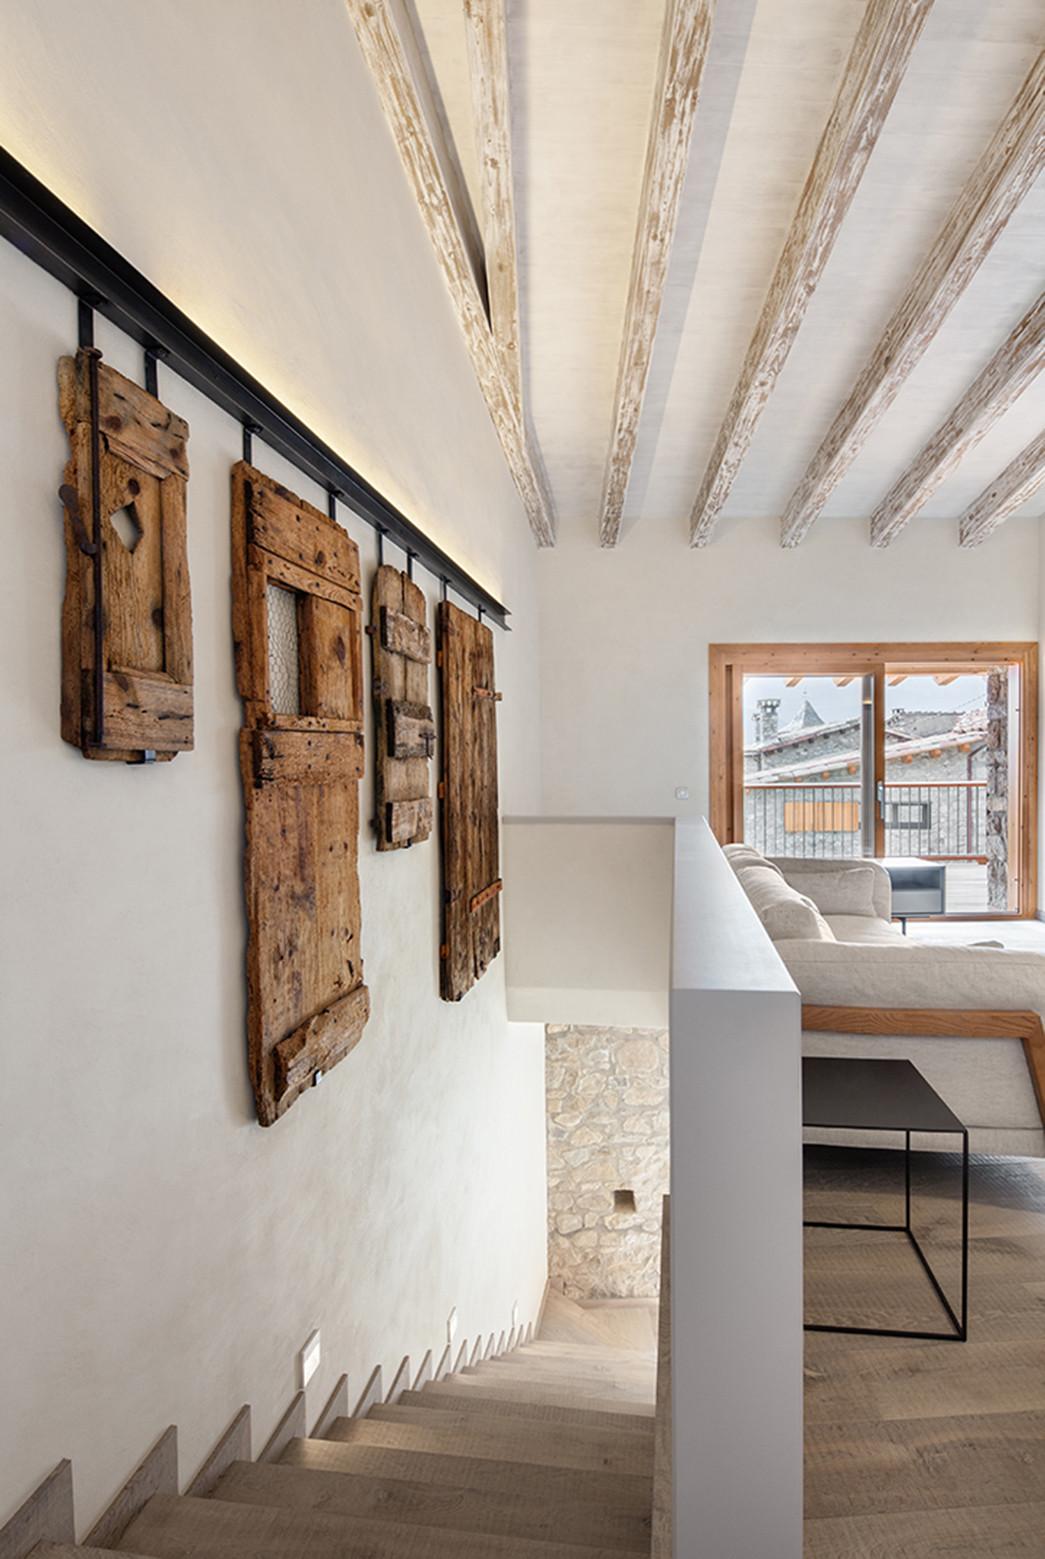 Galeria de reabilita o de um conjunto de casas em la - Casas la cerdanya ...